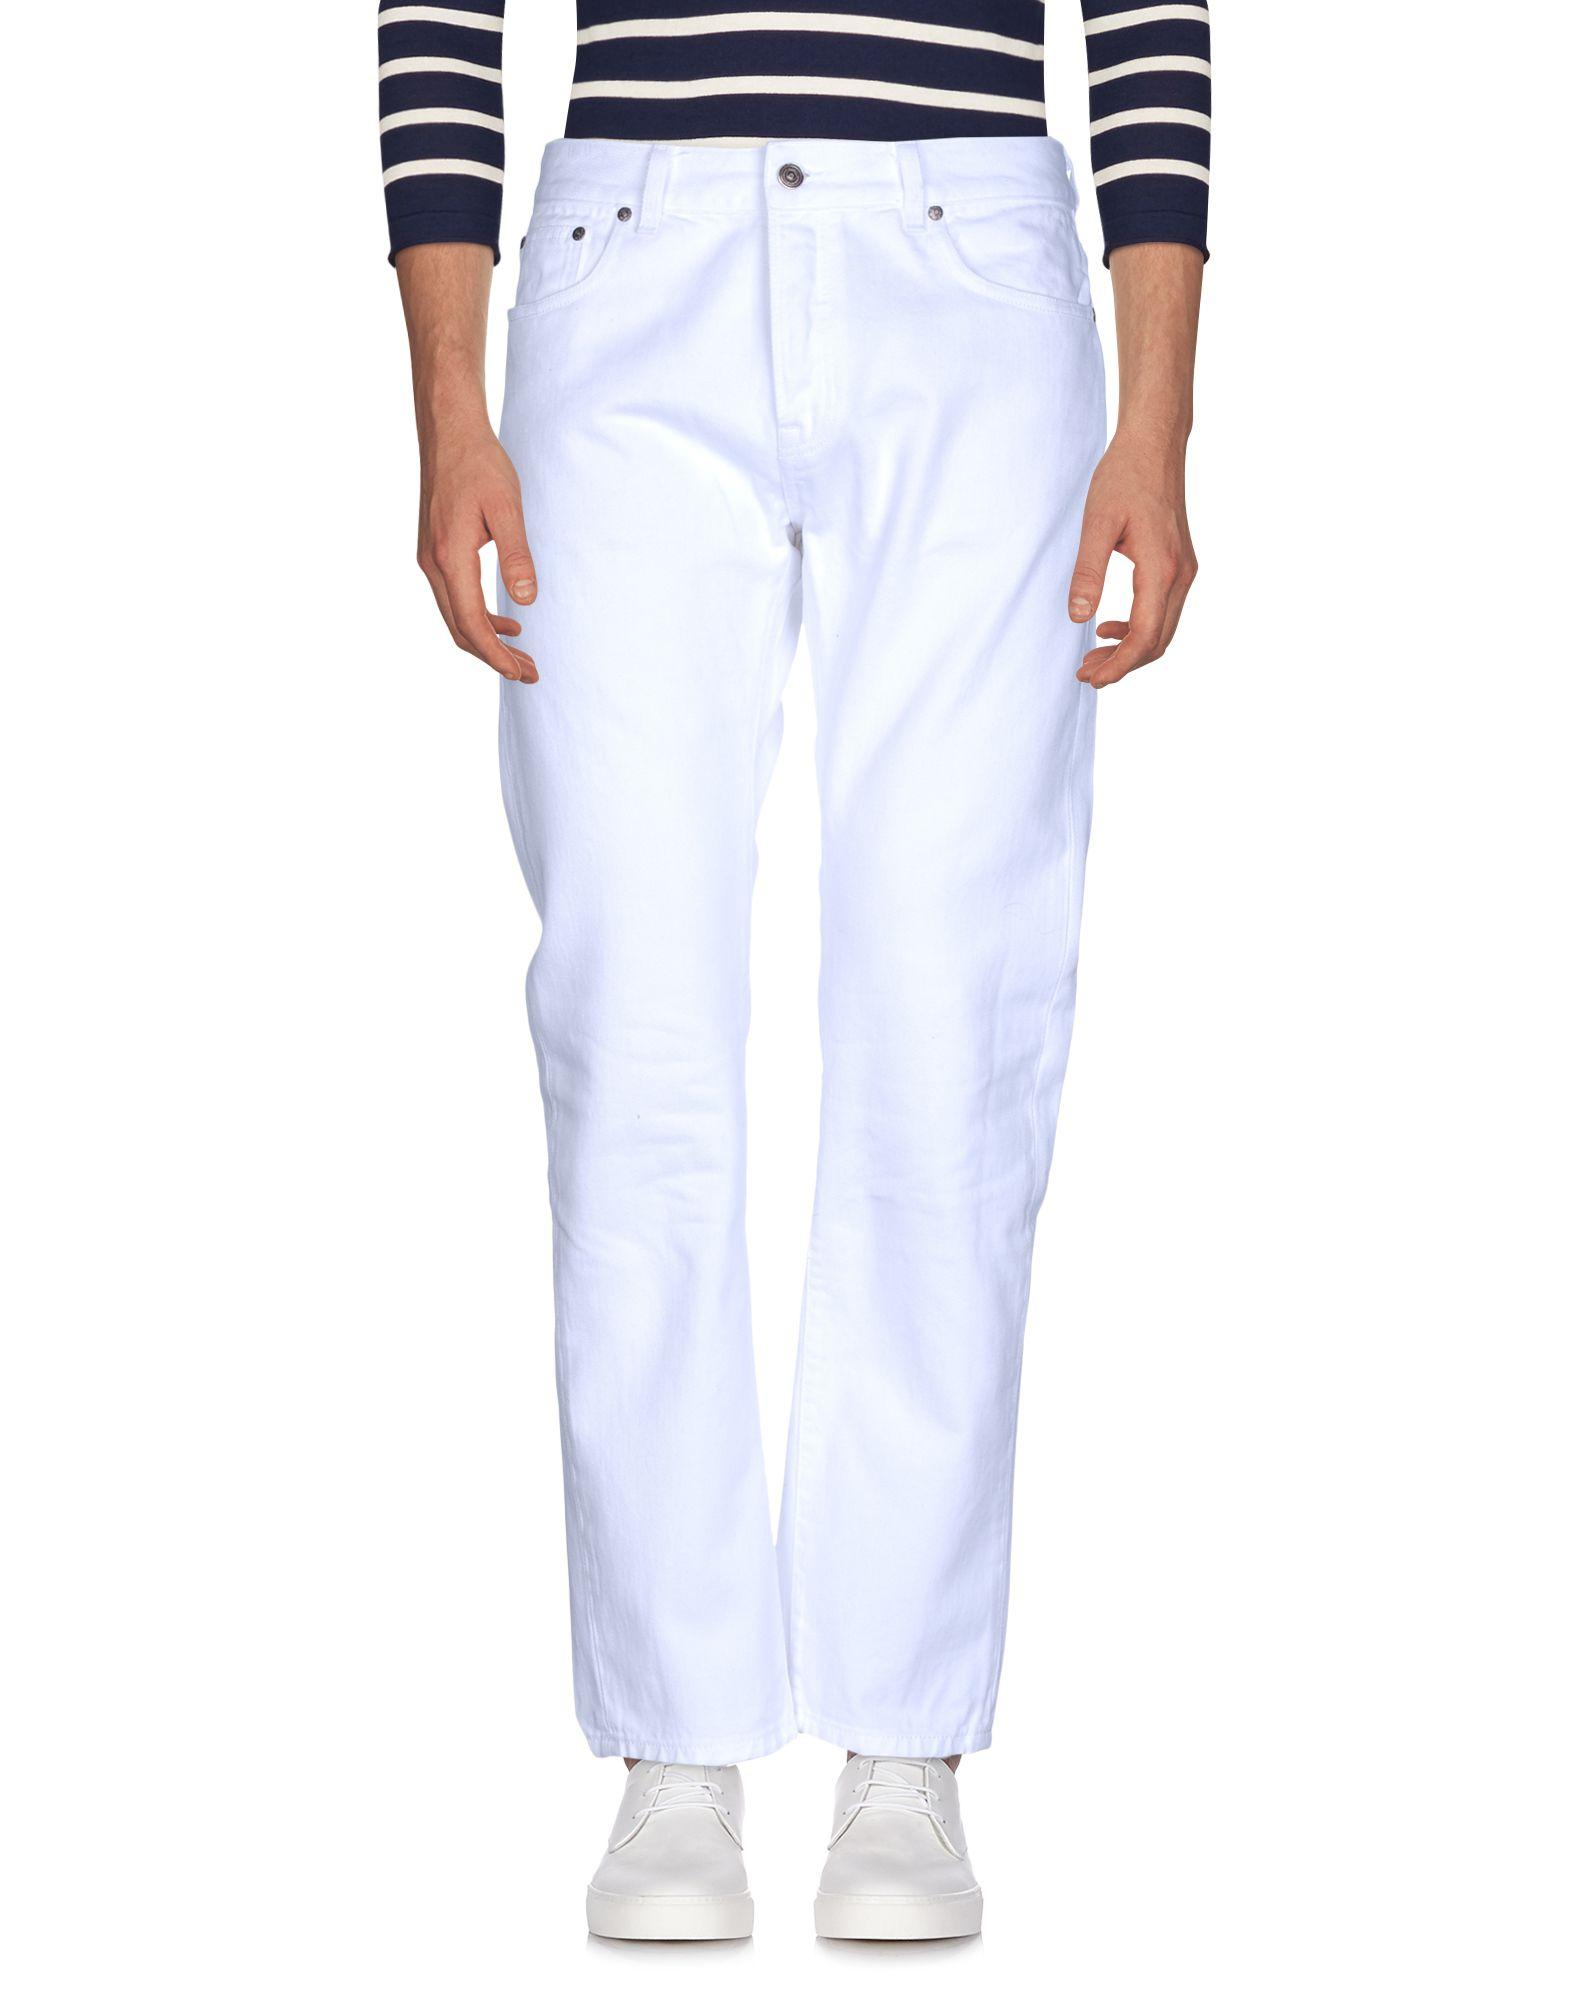 Pantaloni Jeans Umit Benan Uomo - Acquista online su